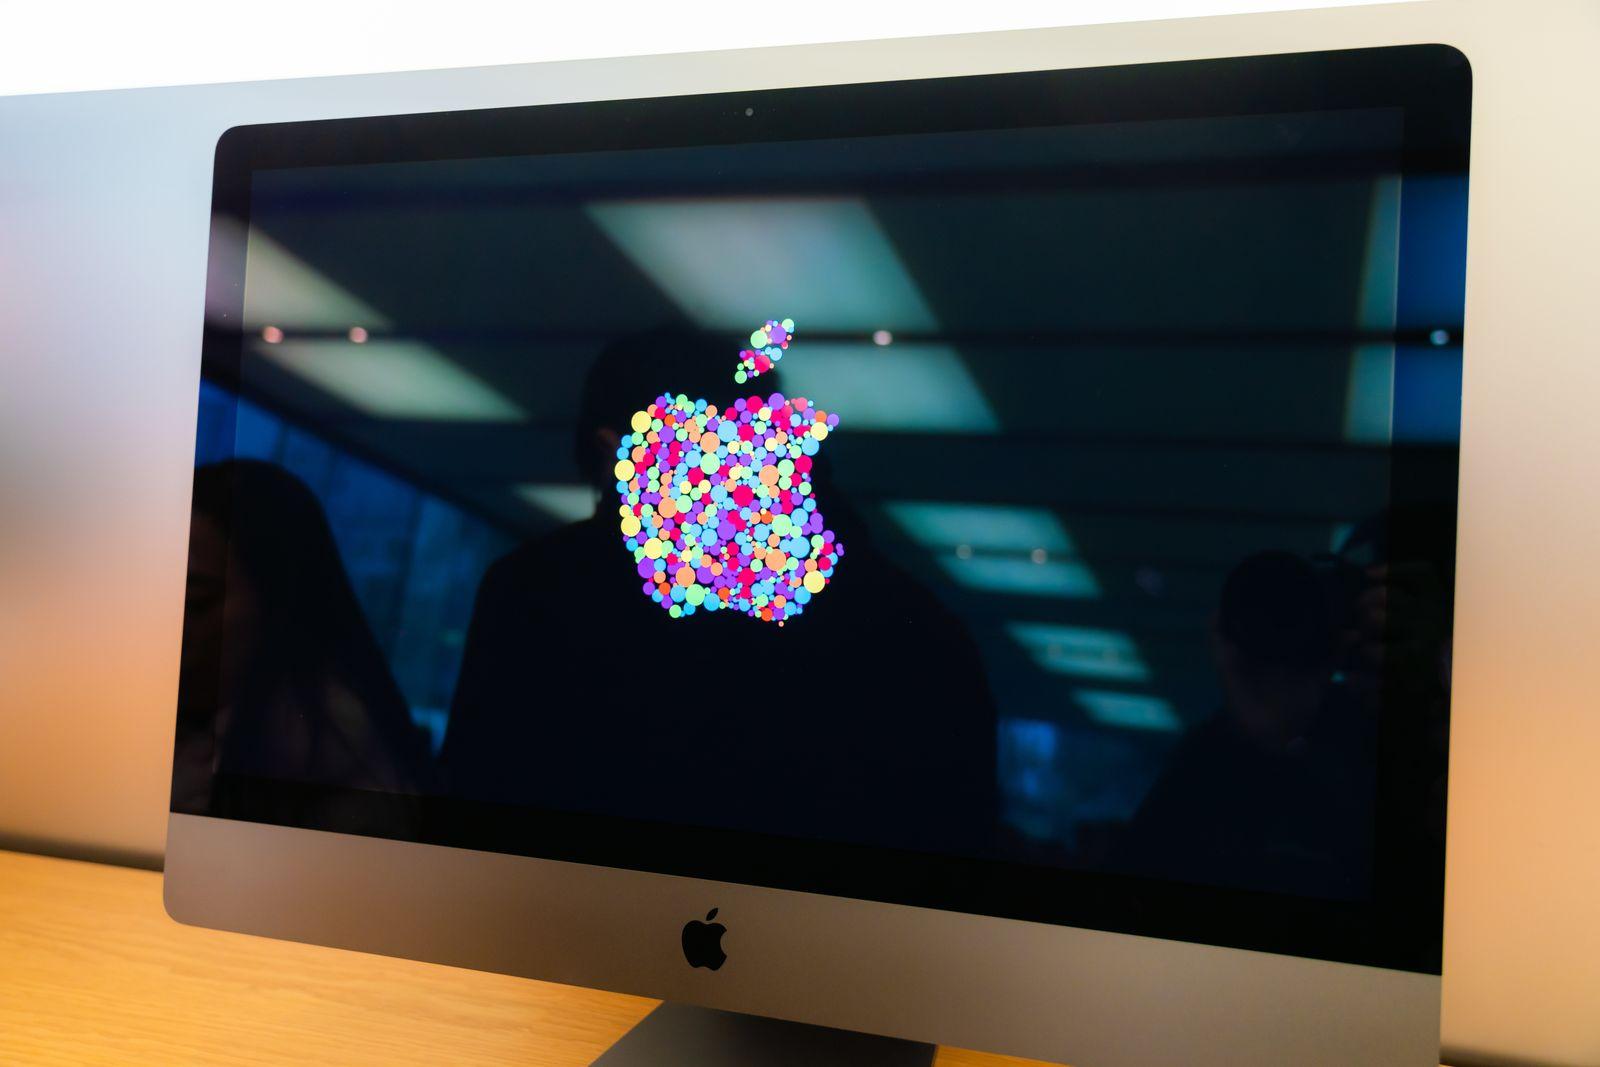 American multinational technology company Apple logo seen on